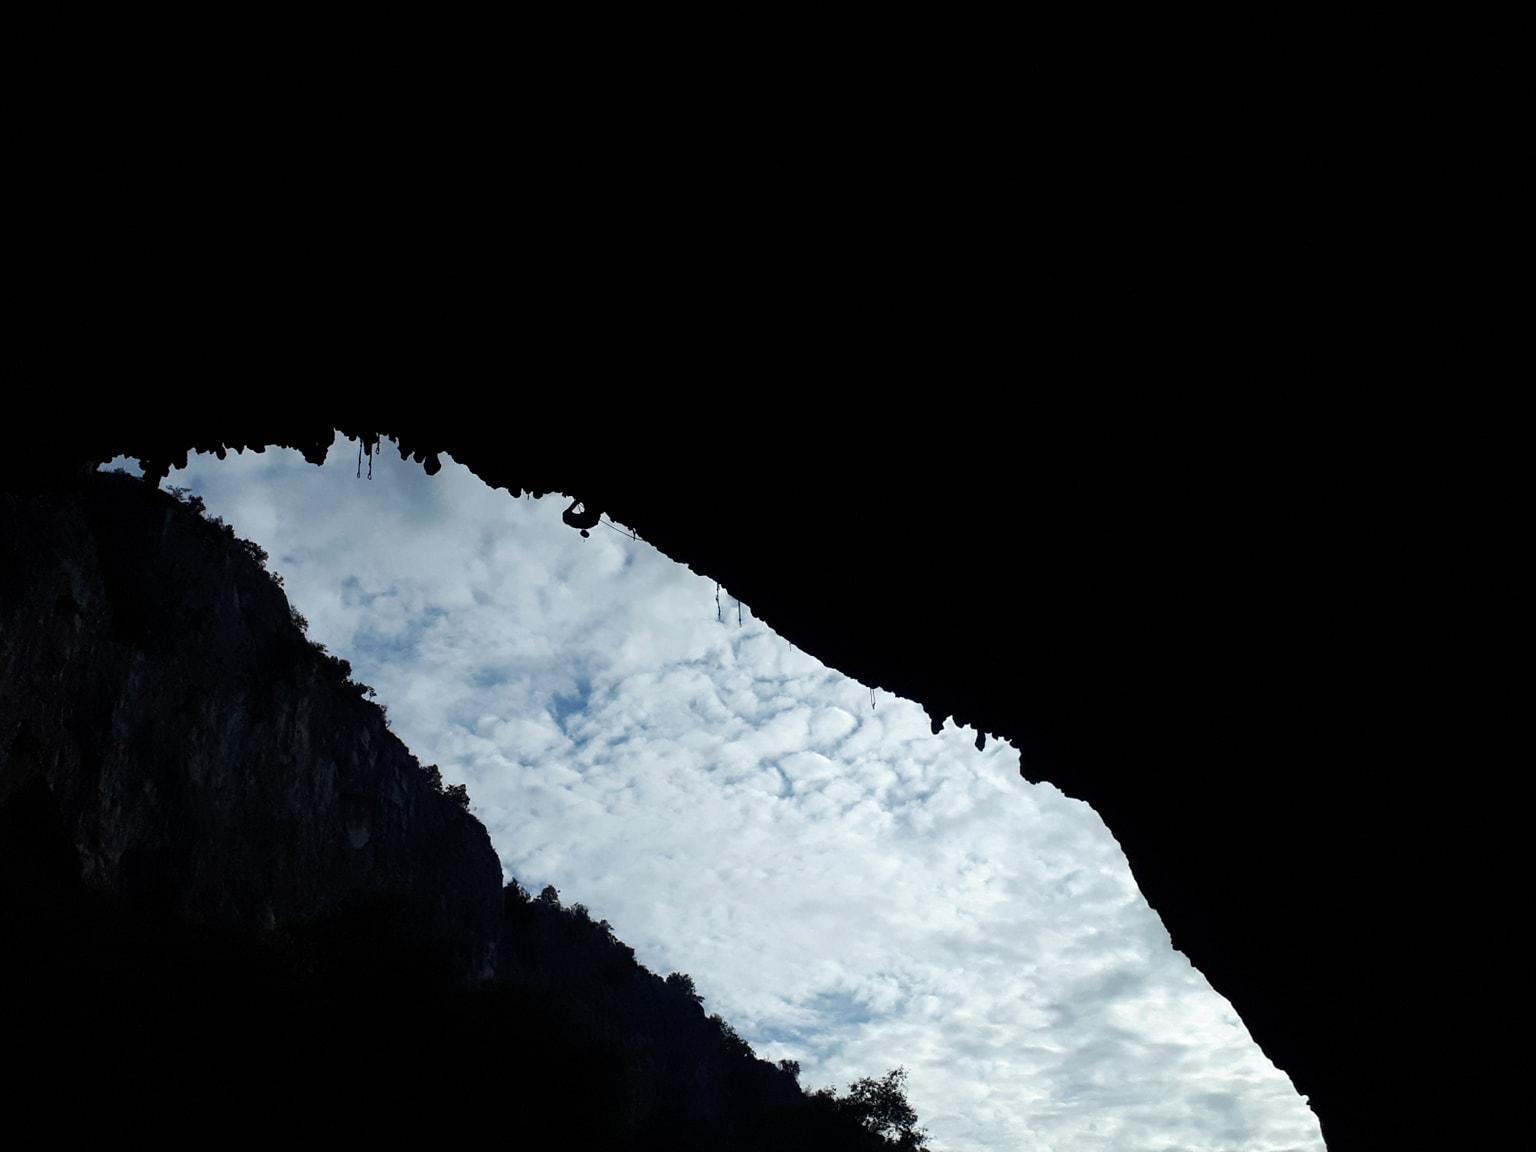 Matteo Menardi in Waterwall (9a) in Osp cave